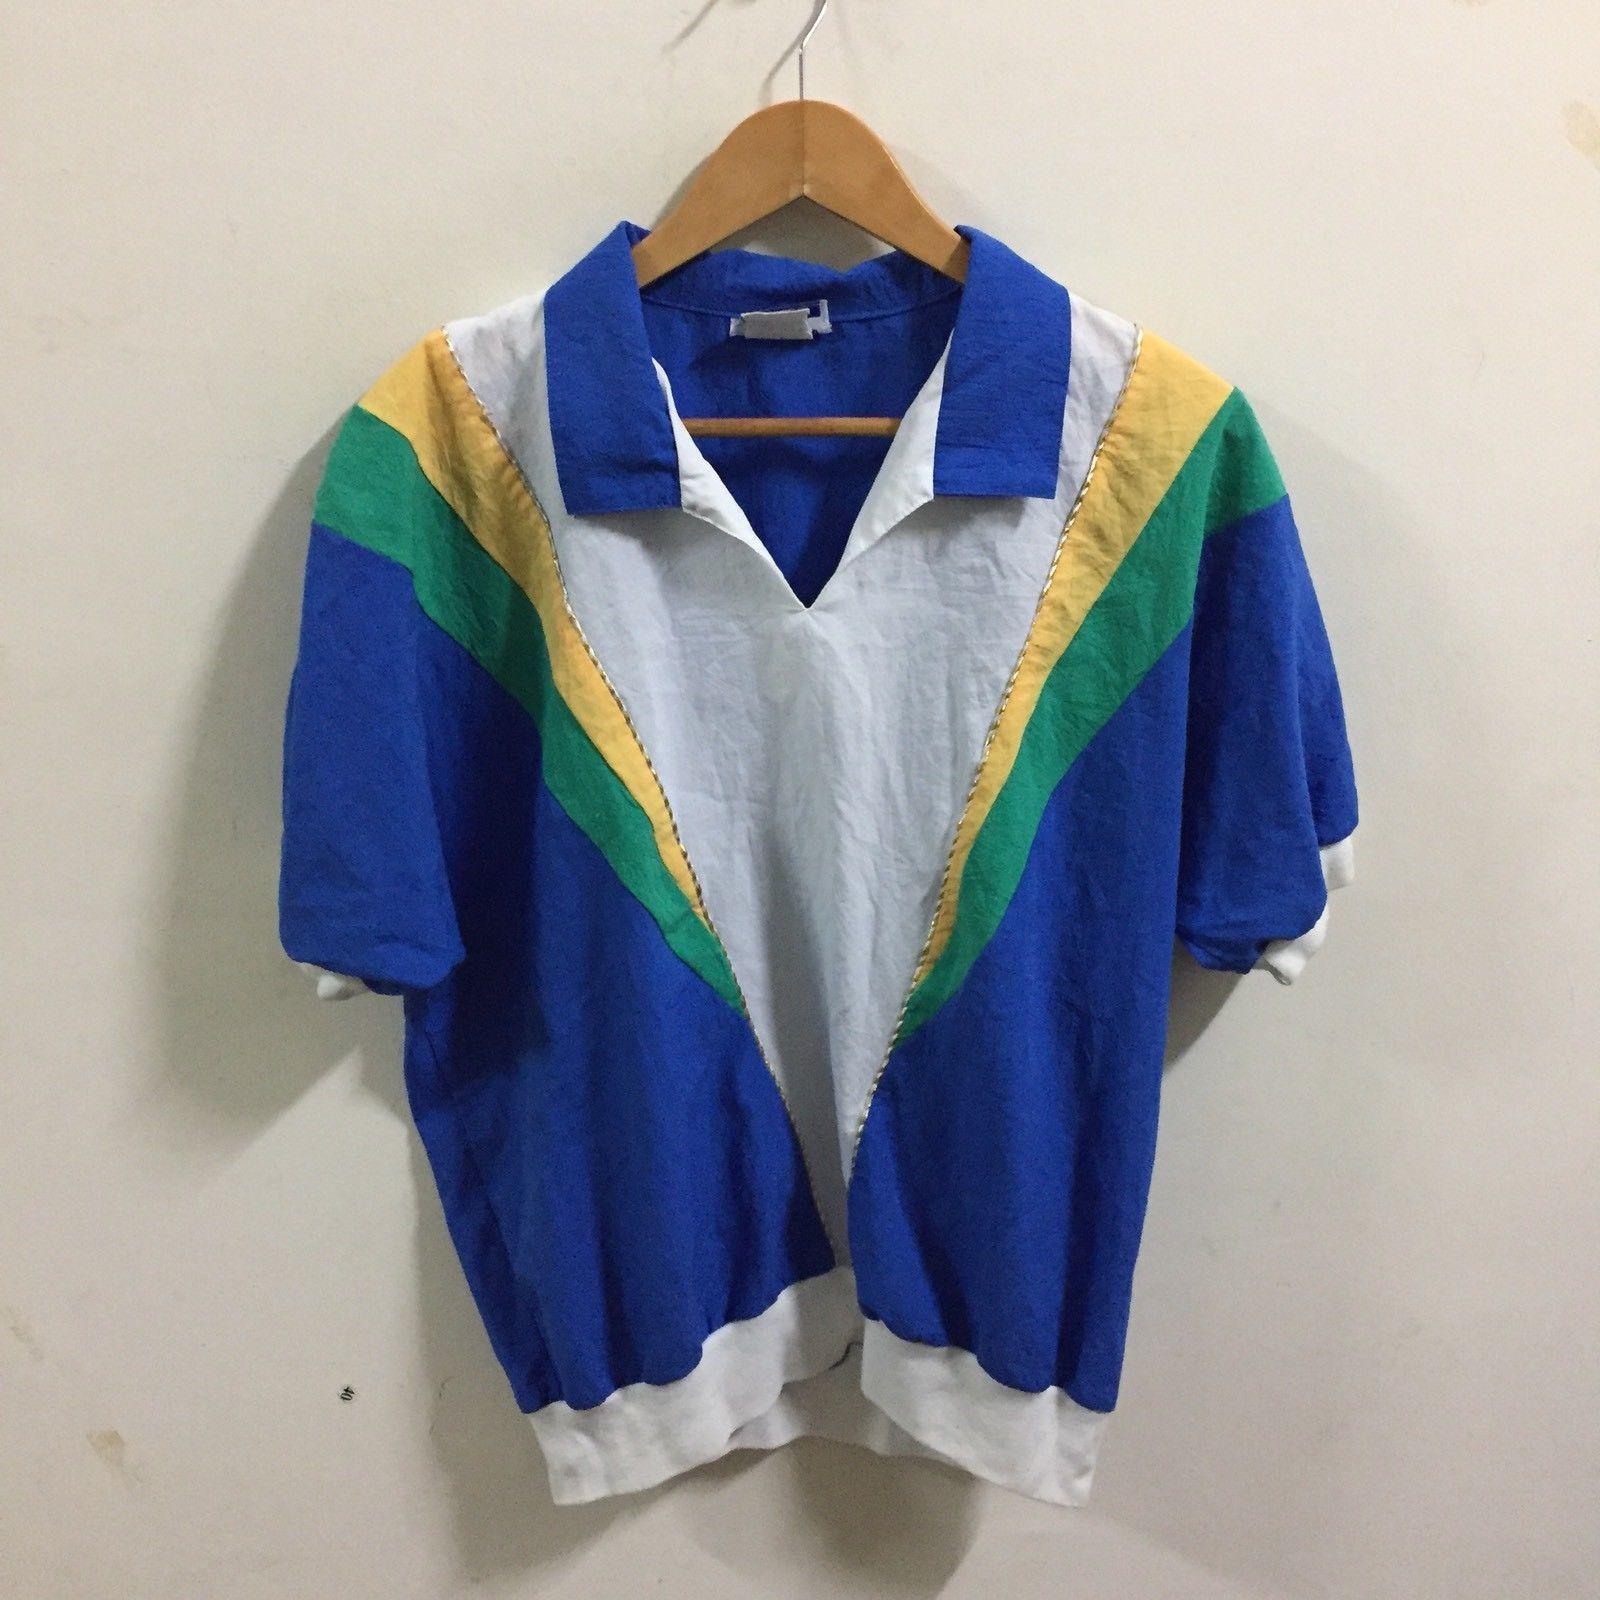 VTG 90's Gape God Tops T-Shirt SZ L ColorBlock  Rare Made In USA image 3